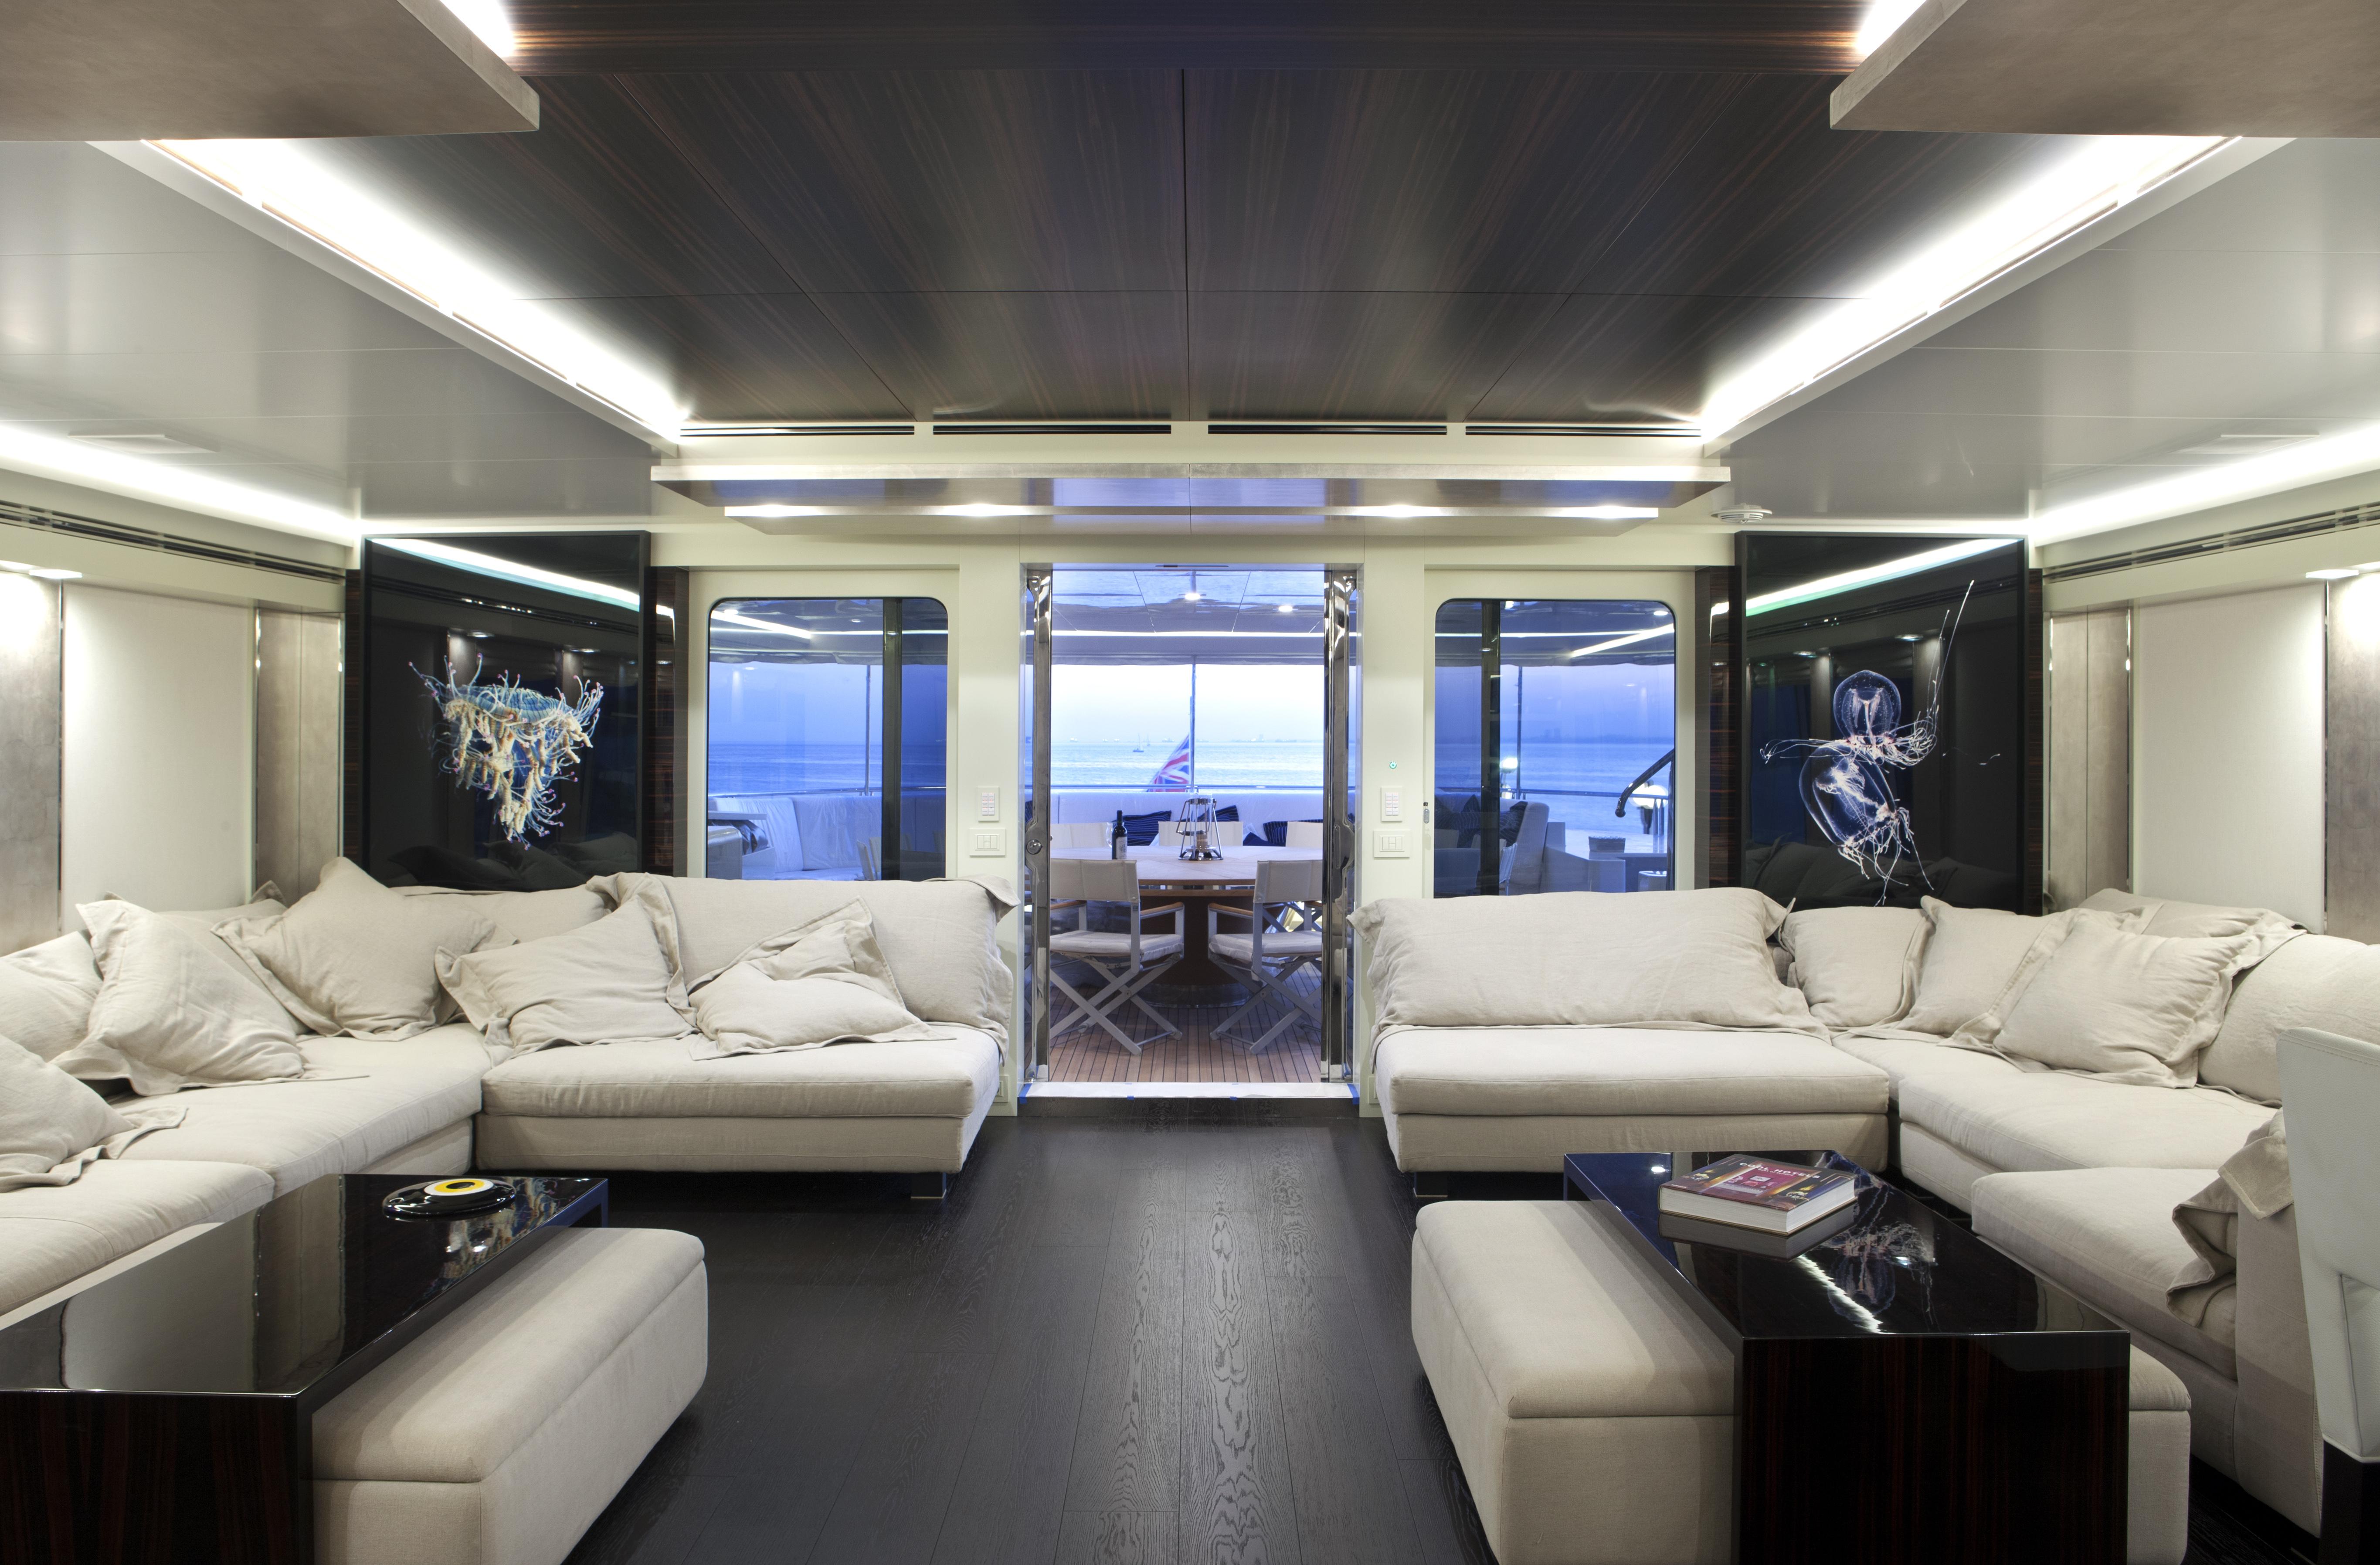 Luxury superyacht keyla interior by hot lab luxury yacht charter - My_keyla_hotlab_18giu2013_1326